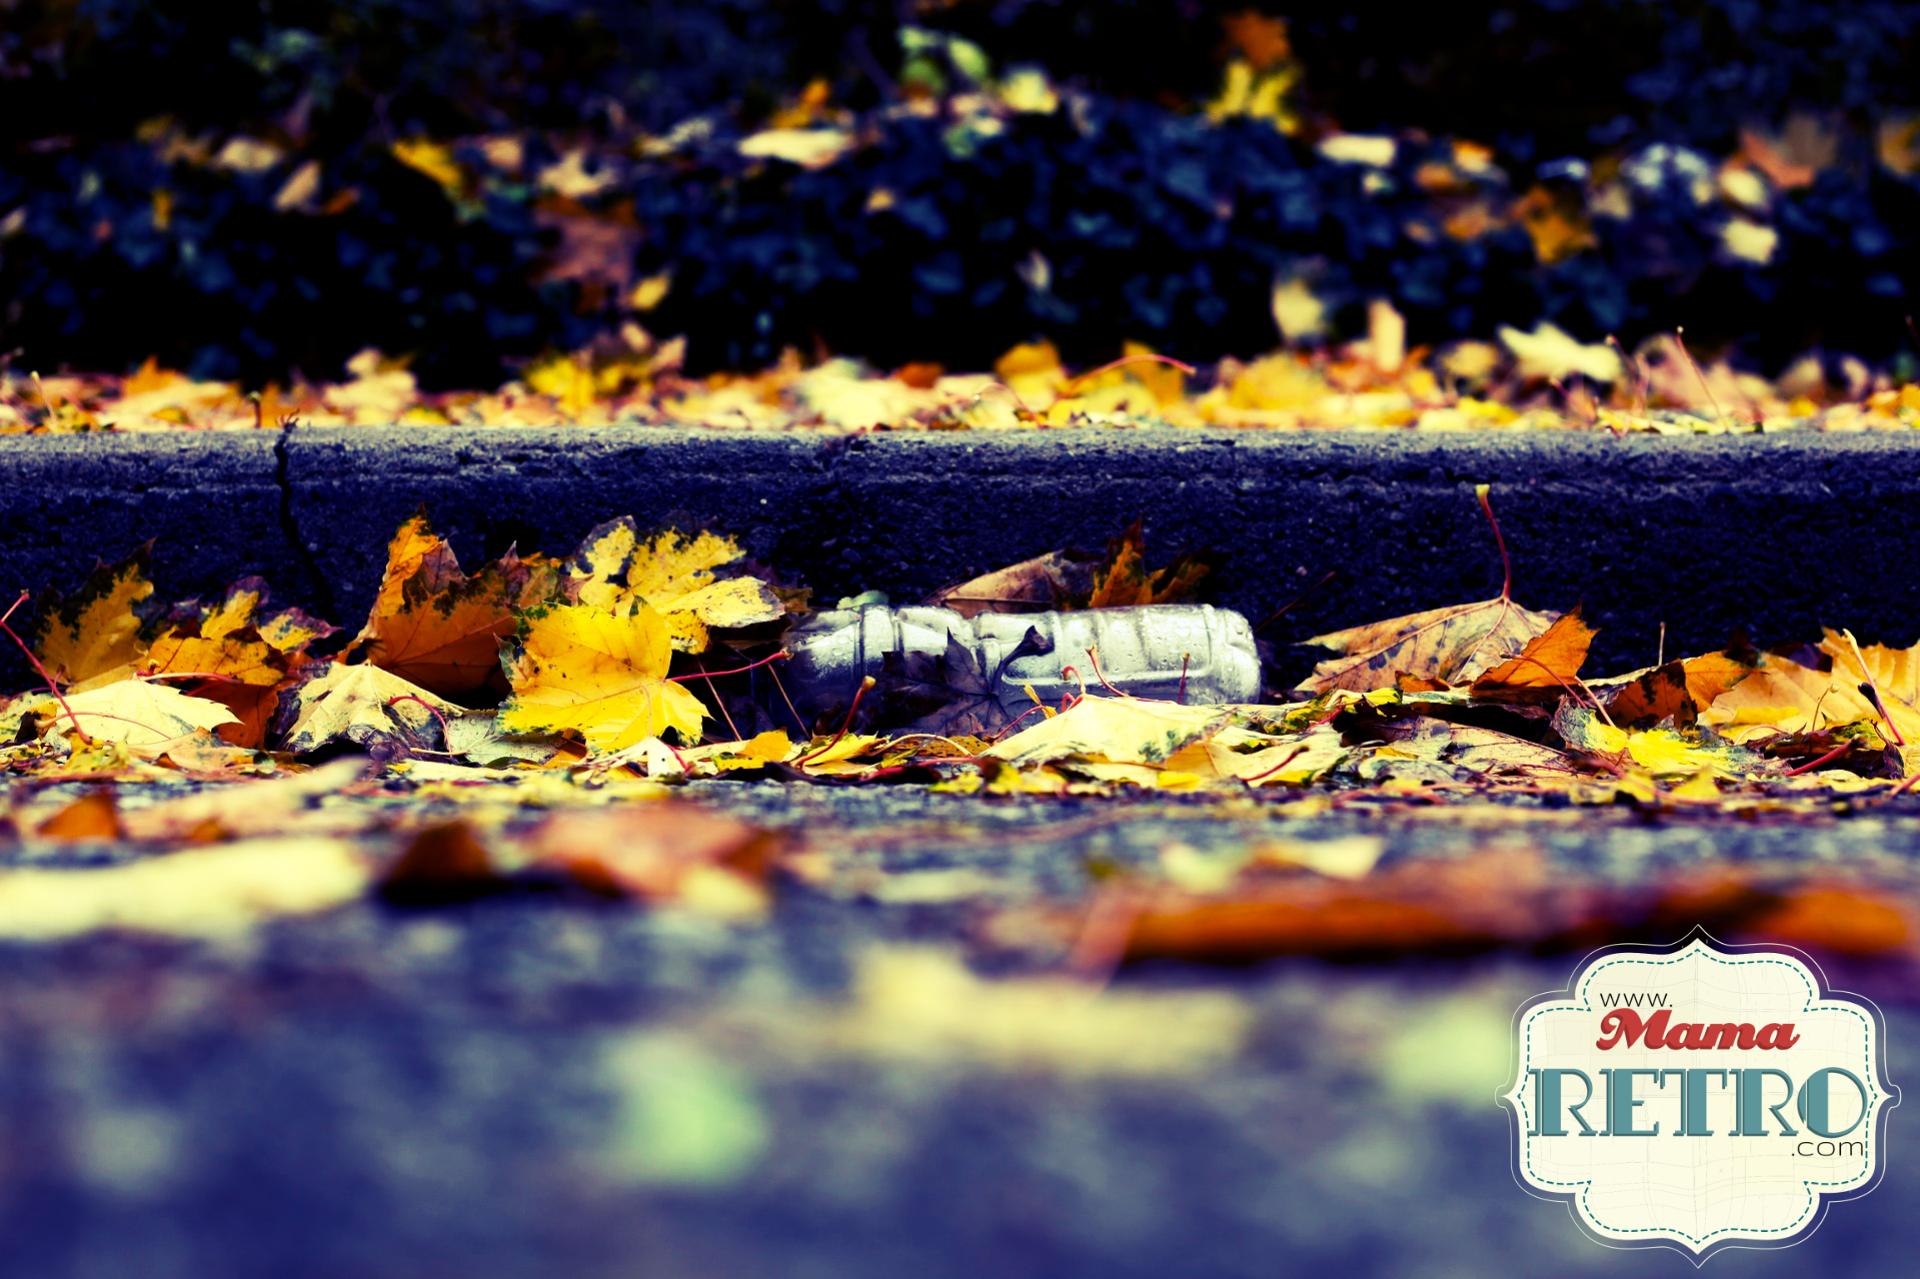 Reducir residuos Imagen de Jasmin Sessler en Pixabay